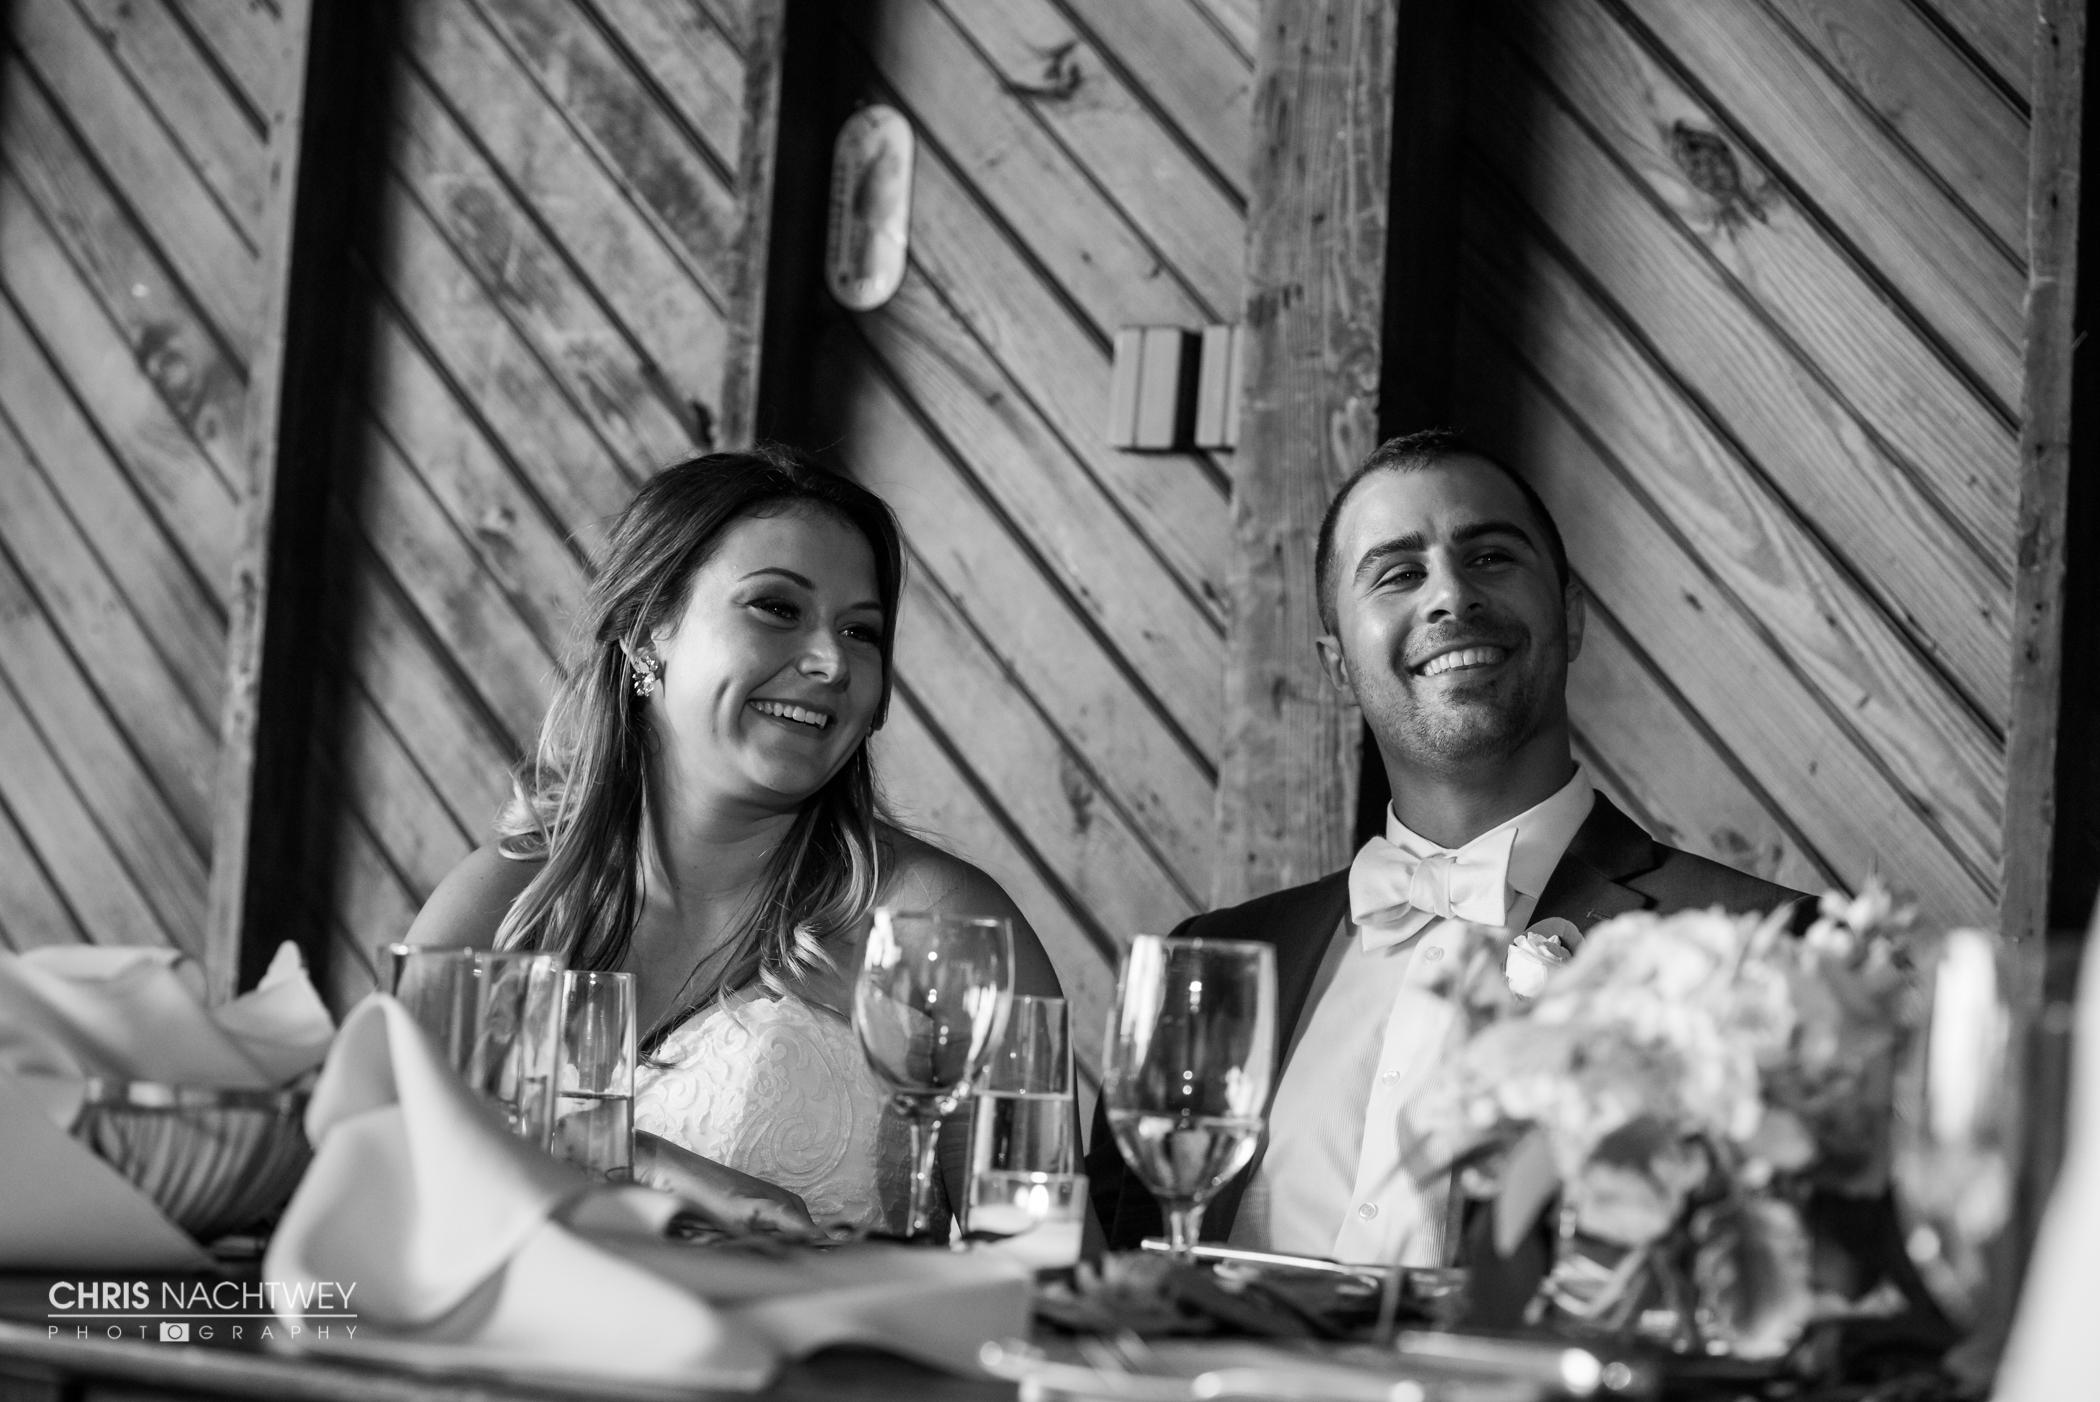 saltwater-farm-vineyard-wedding-photos-lindsay-gabe-chris-nachtwey-photography-2017-46.jpg